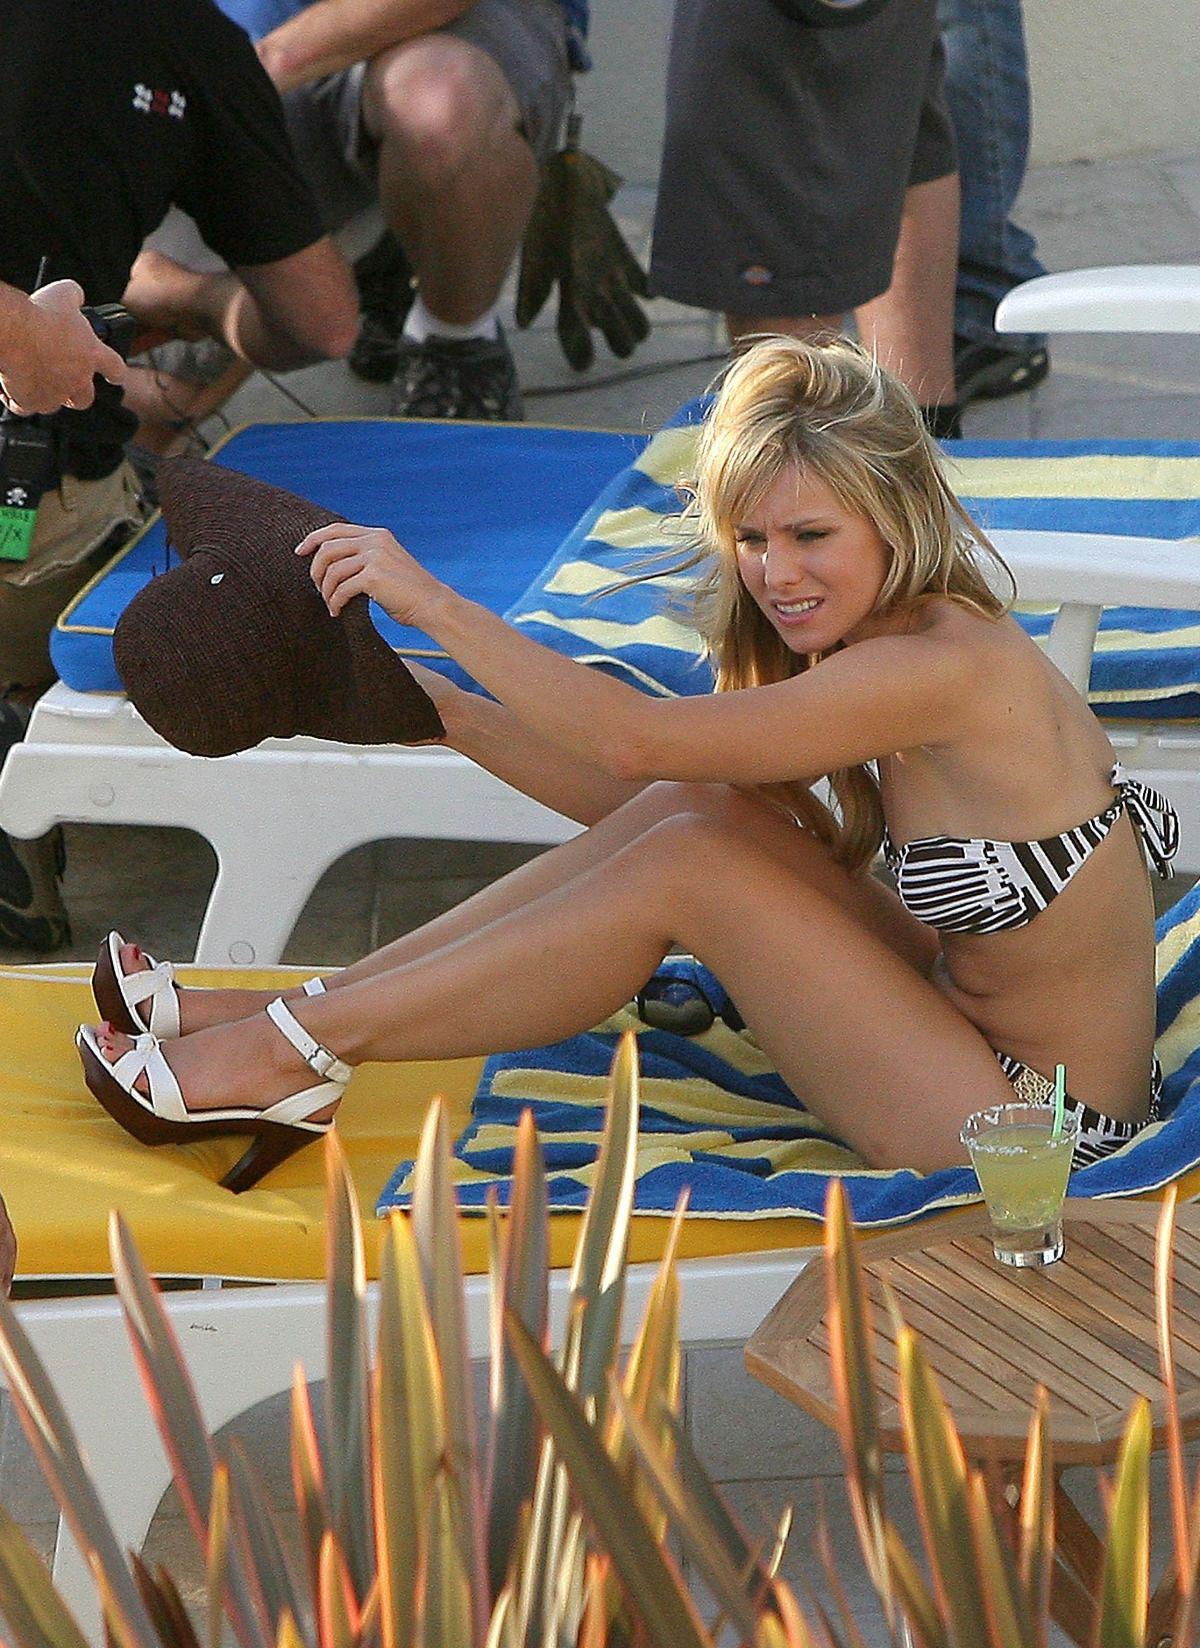 48271 Kristen Bell bikini candids on the set of Heroes 001 122 122 521lo Gay Entertainment, Gossip, Music, Fashion   Popnography: Blake's audio gay ...